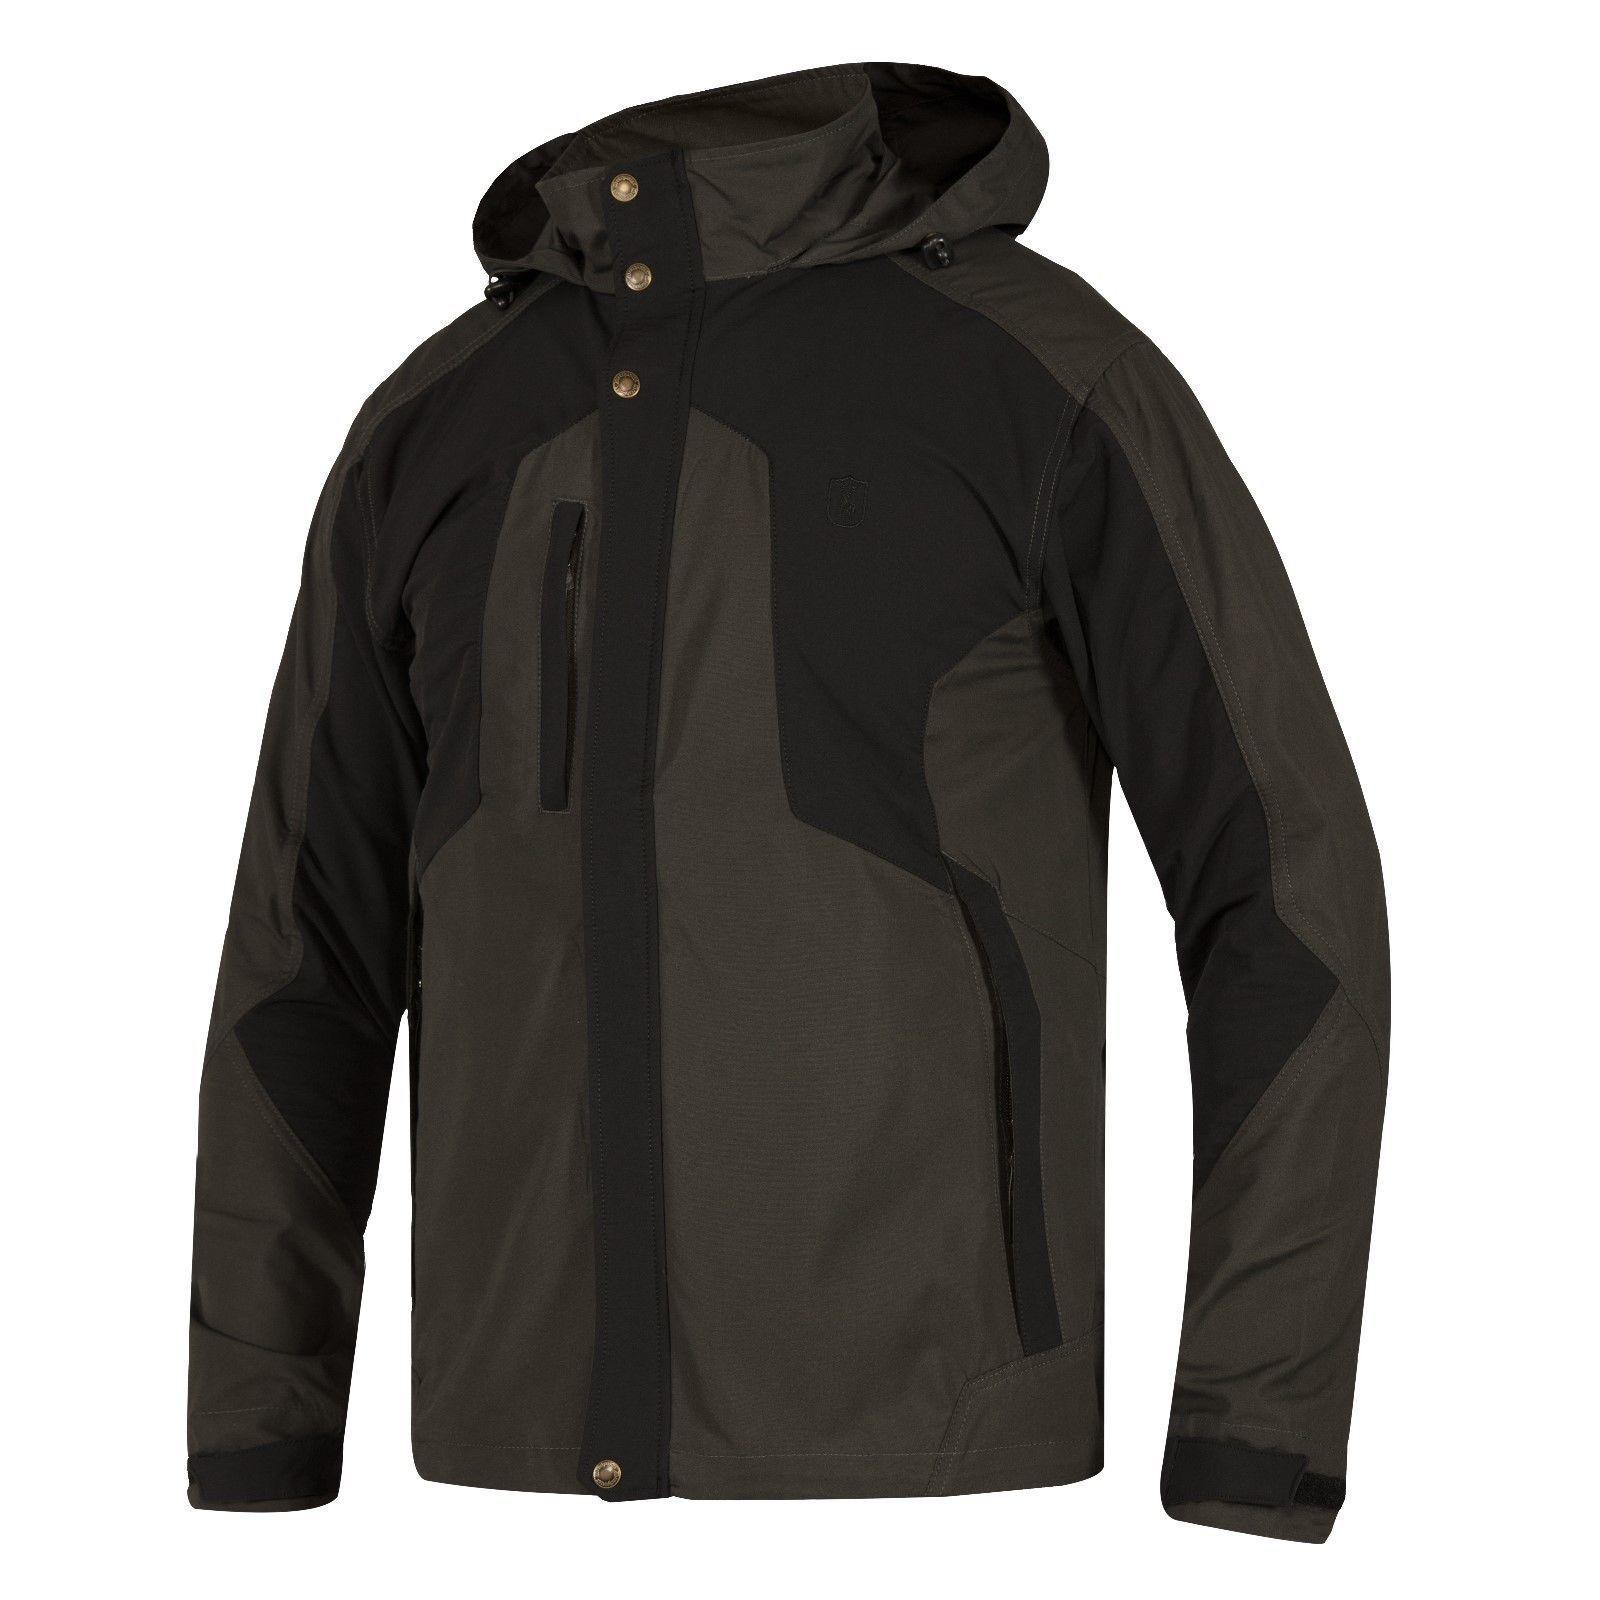 Deerhunter Strike Jacket 985 Tinta Negra Para Hombre Chaqueta caza tiro ligero